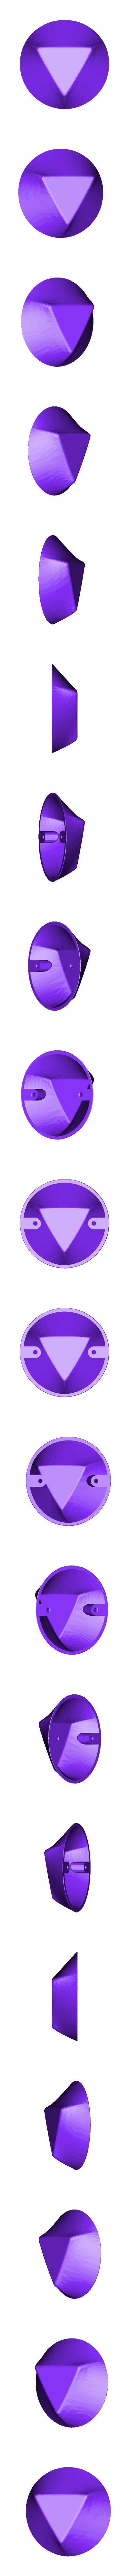 Steven Universe GemBLUE-TOP.STL Download STL file Steven Universe LED GEM, Wearable Glow Light Up Crystal Prop Amethyst Rose Quartz Pearl, Cosplay, Costume, Halloween • 3D printer model, mechengineermike